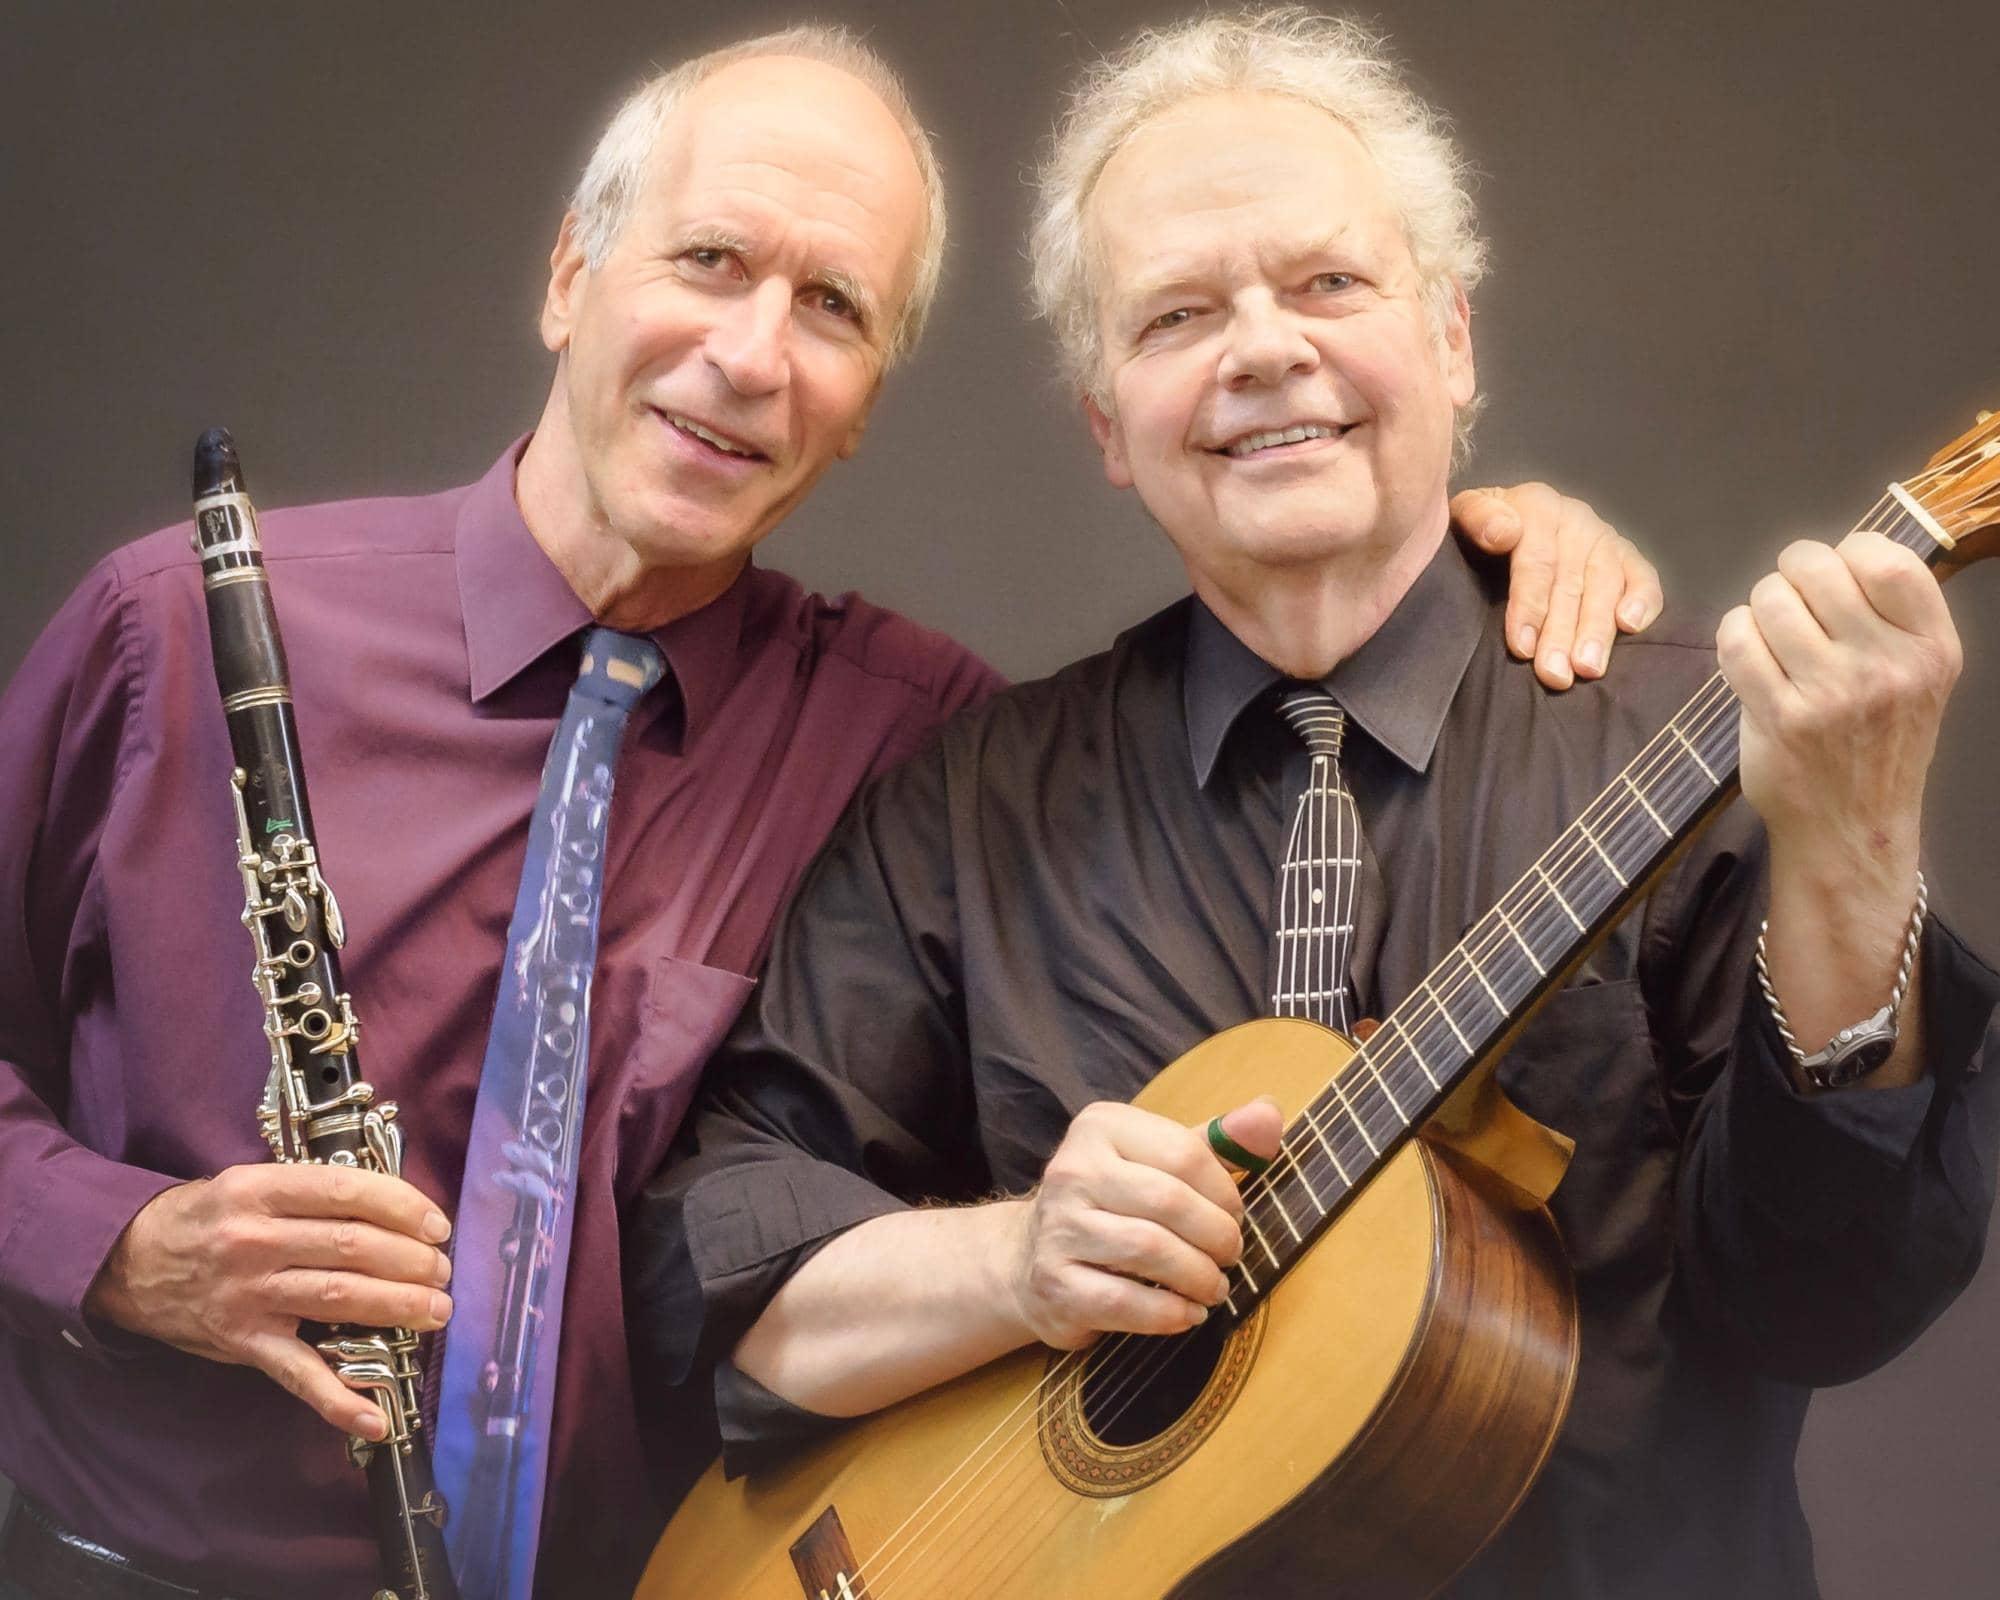 Billy Novick & Guy Van Duser